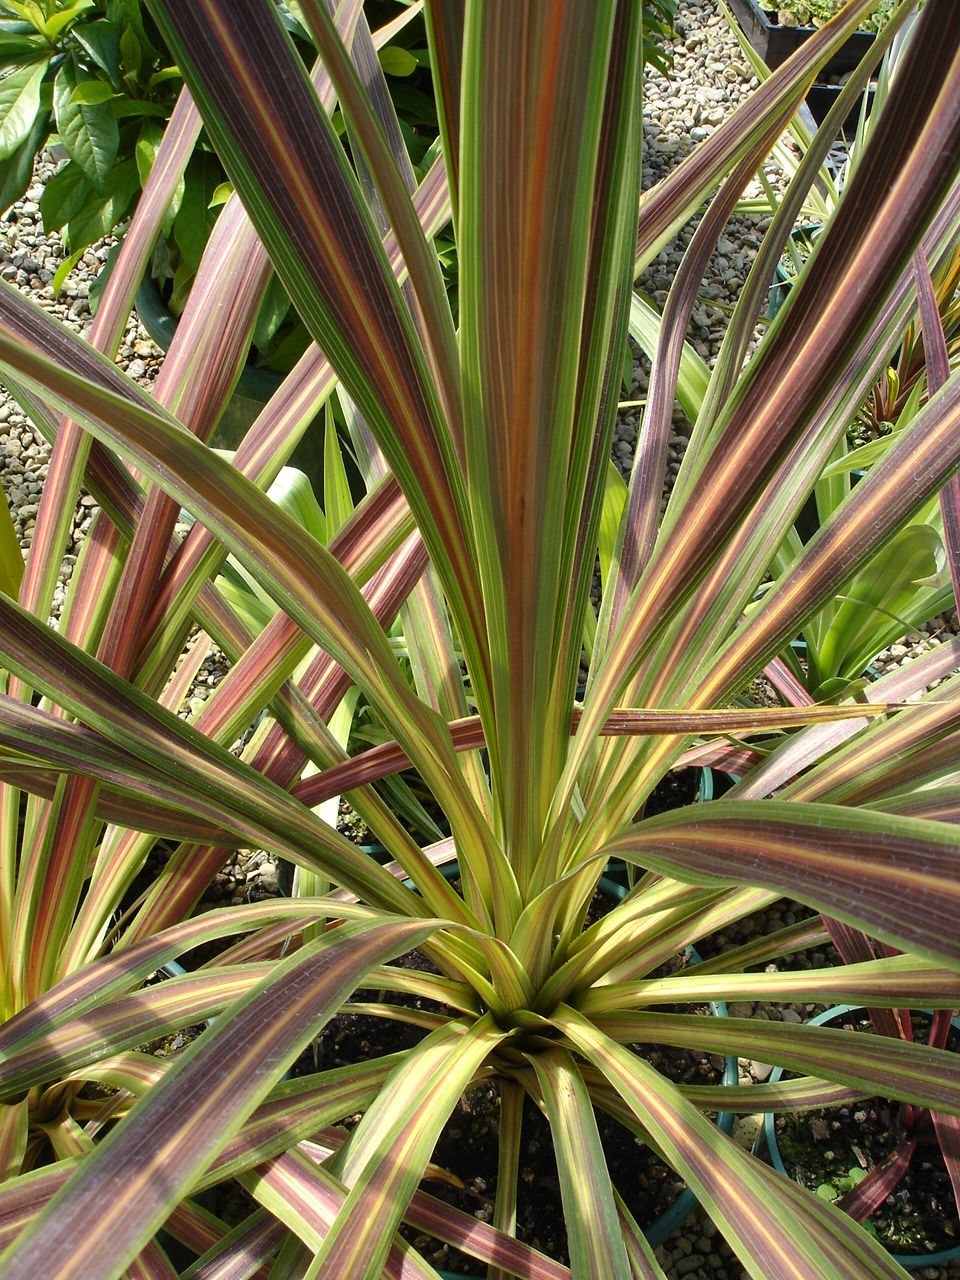 Cordyline Australis Tropical House Plants Cool Plants Torbay